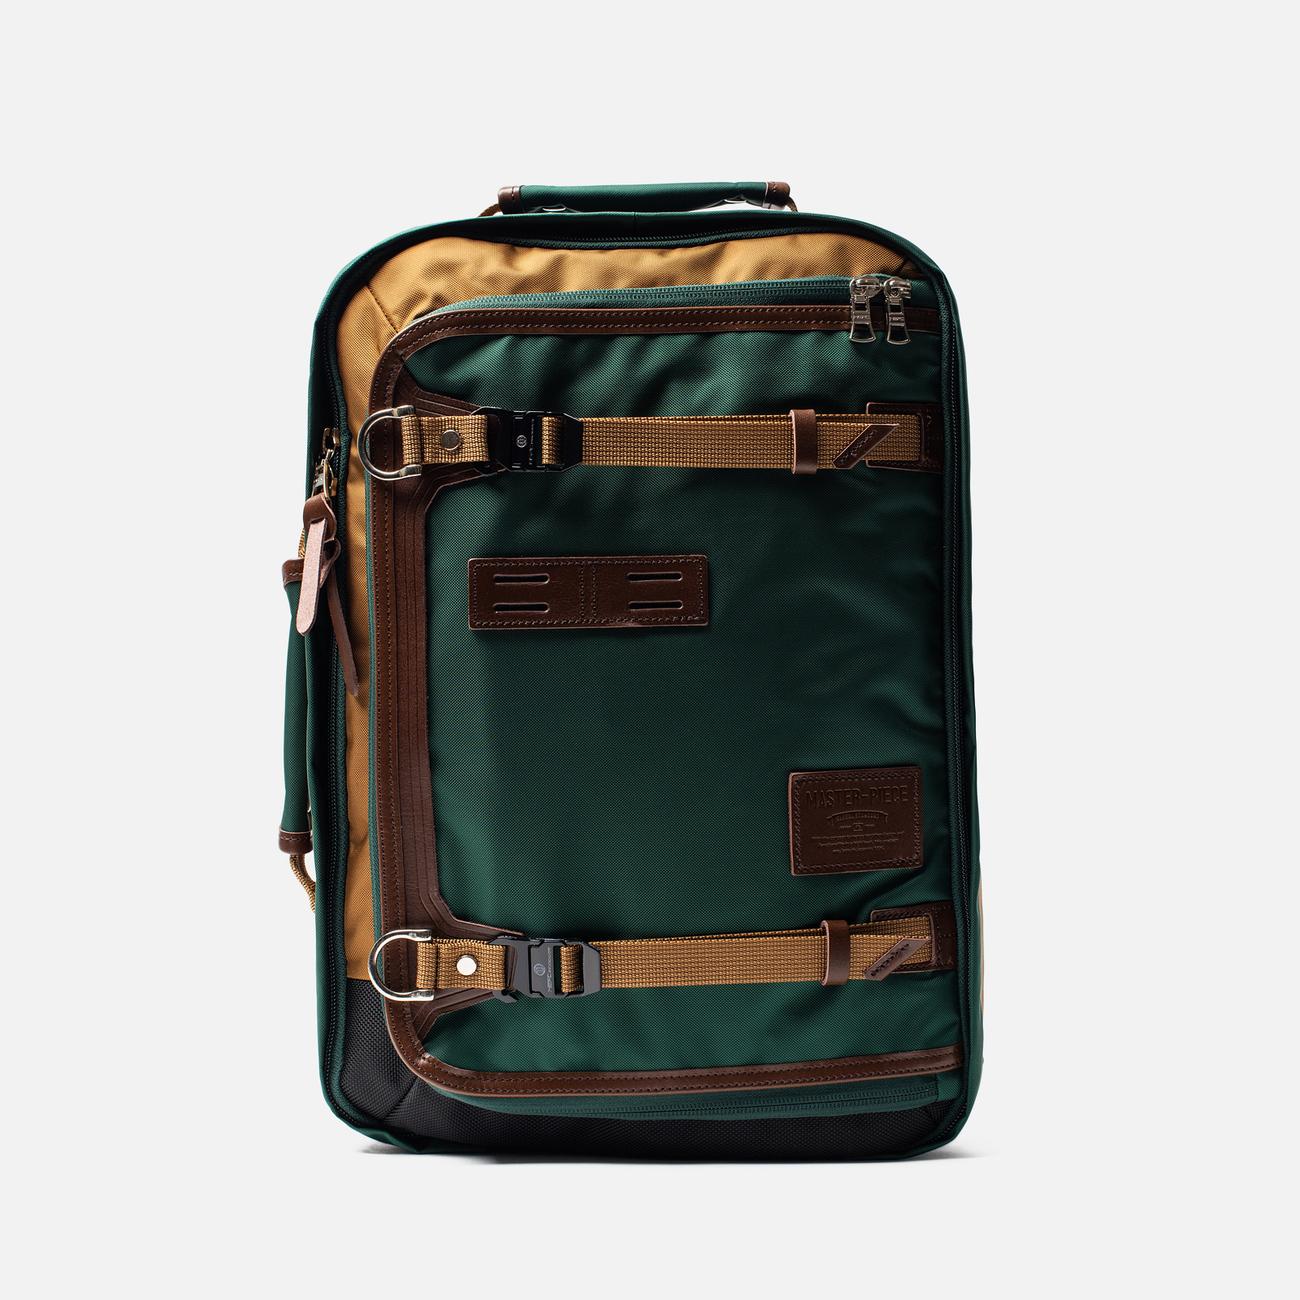 Рюкзак Master-piece Potential ver.2 2-Way 16L Green